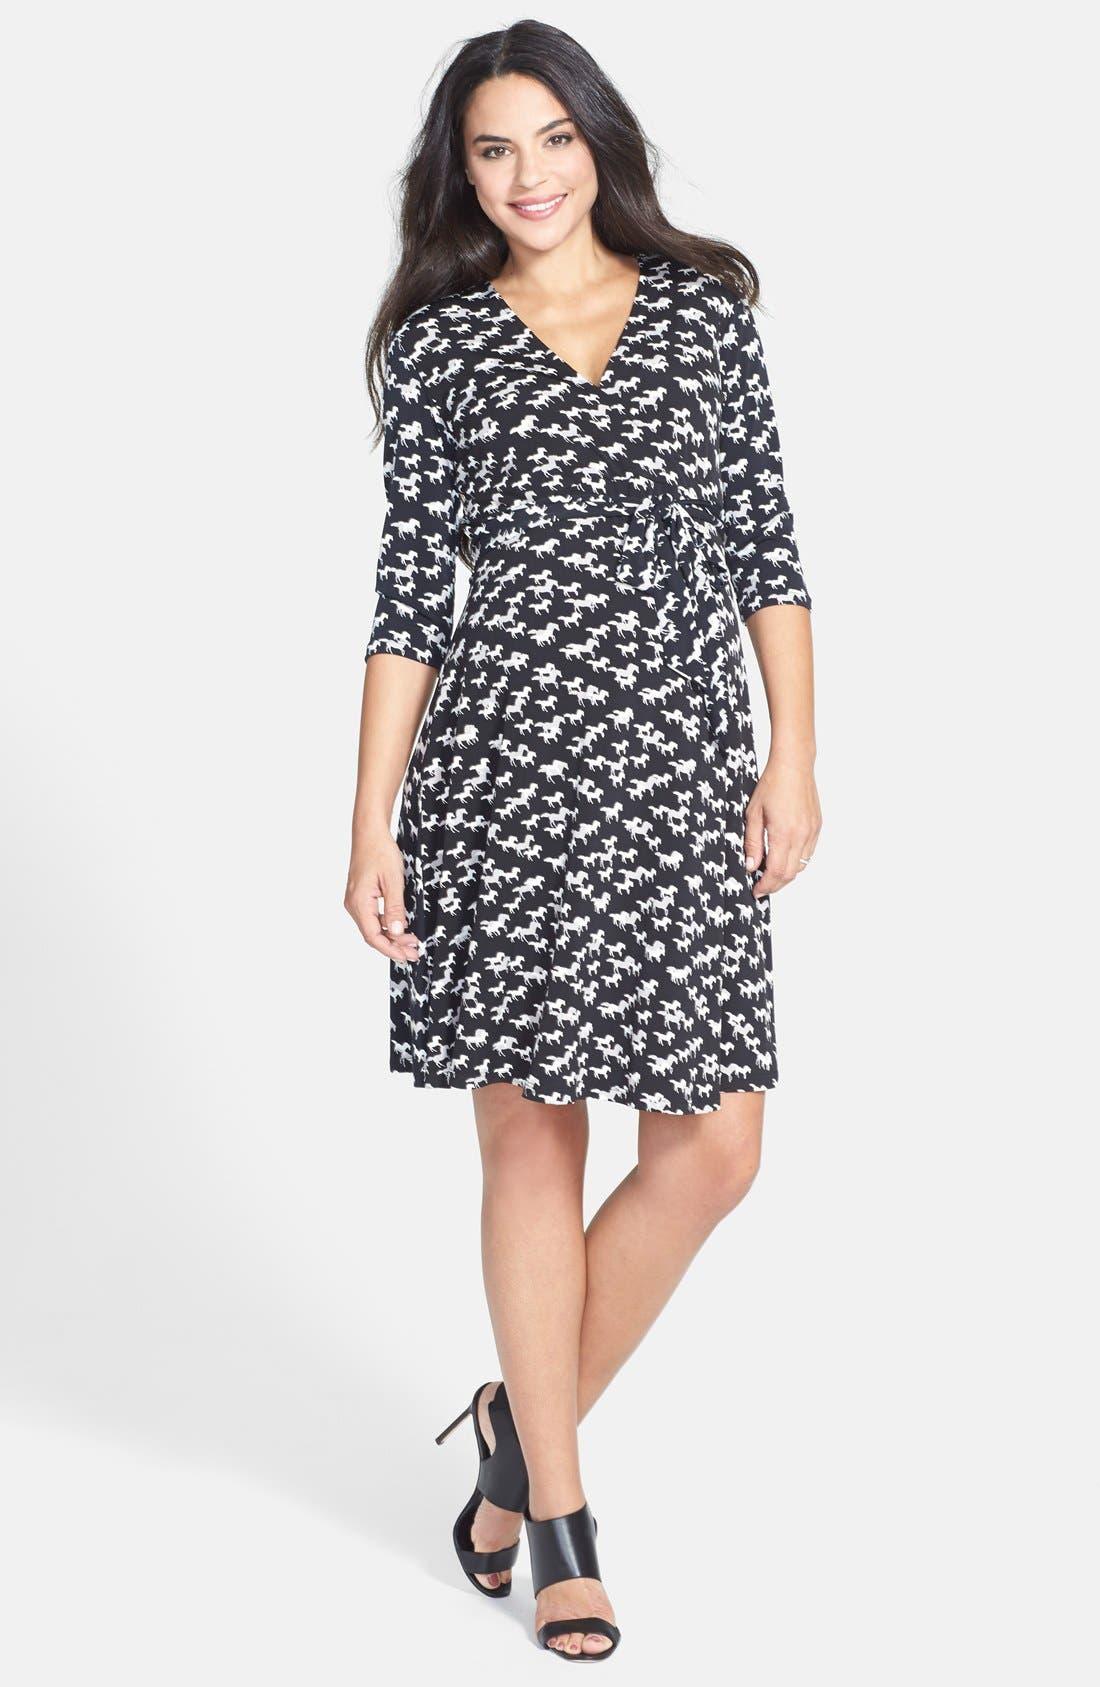 Alternate Image 1 Selected - Leota 'Perfect Wrap' Sheath Maternity Dress